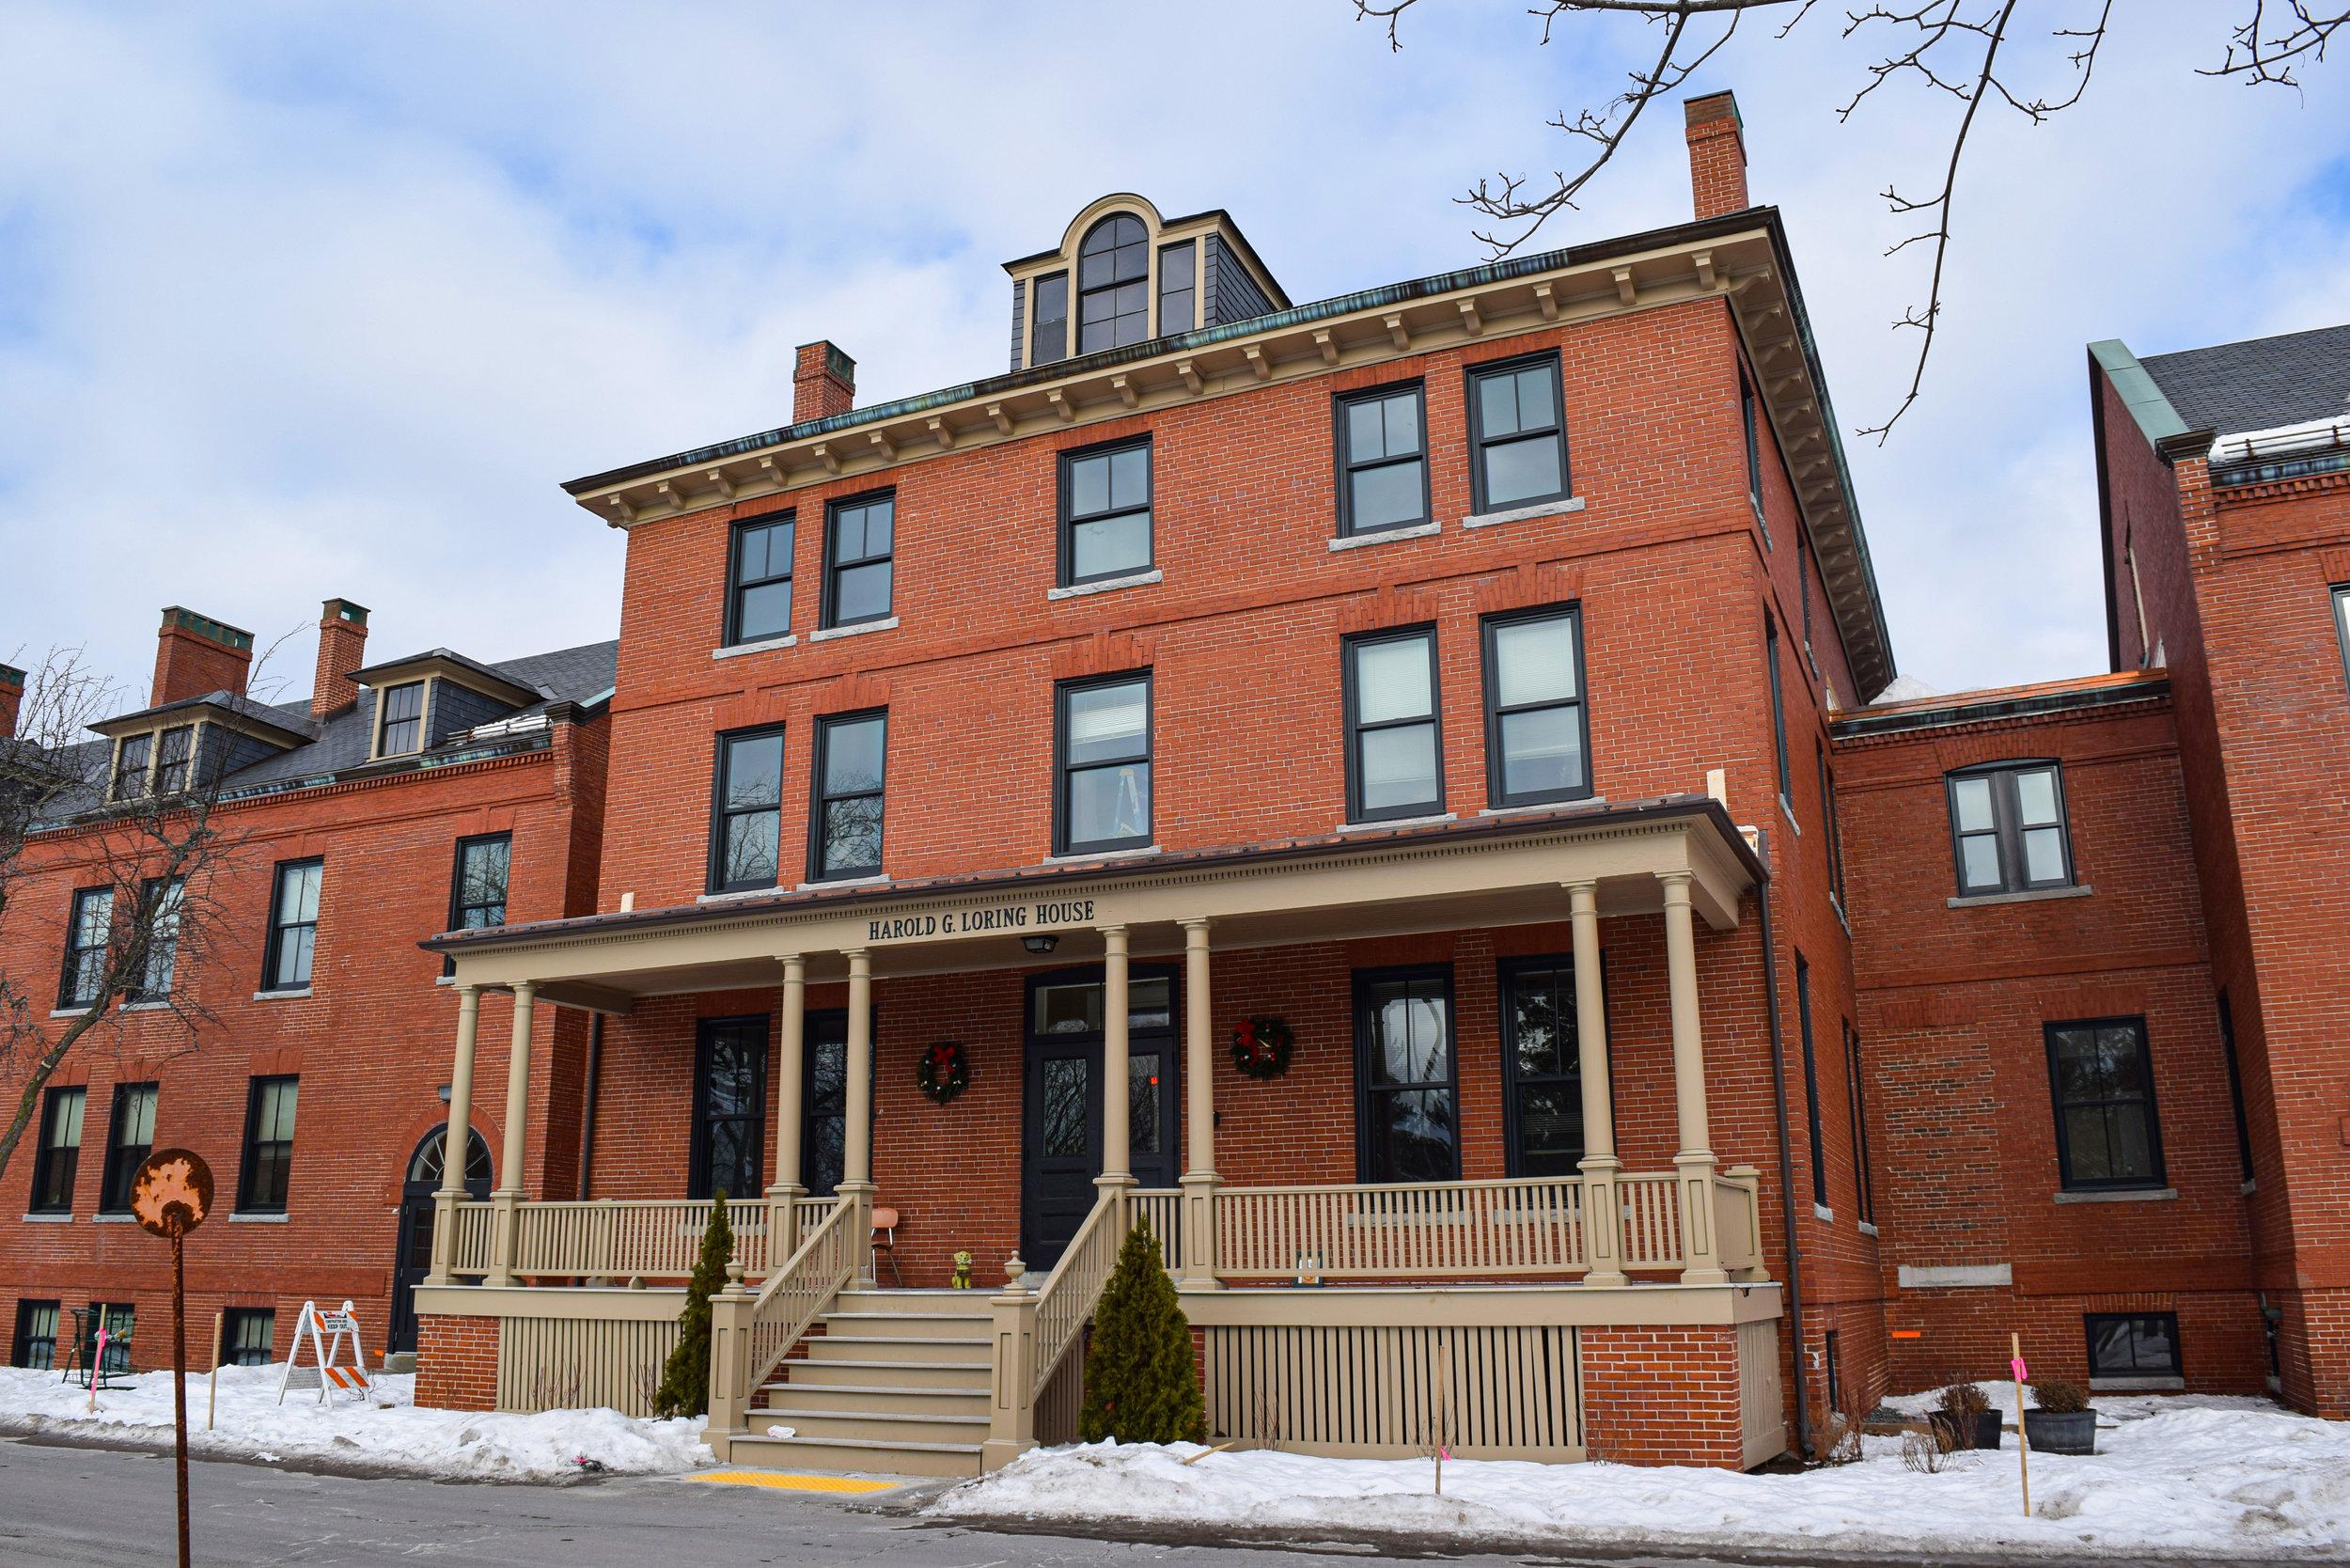 Loring House - Portland, MEResidentialClient: Wishrock GroupBuilt: 1902-1928Project Costs: $17.4 millionHTC equity: Over $3.3 million